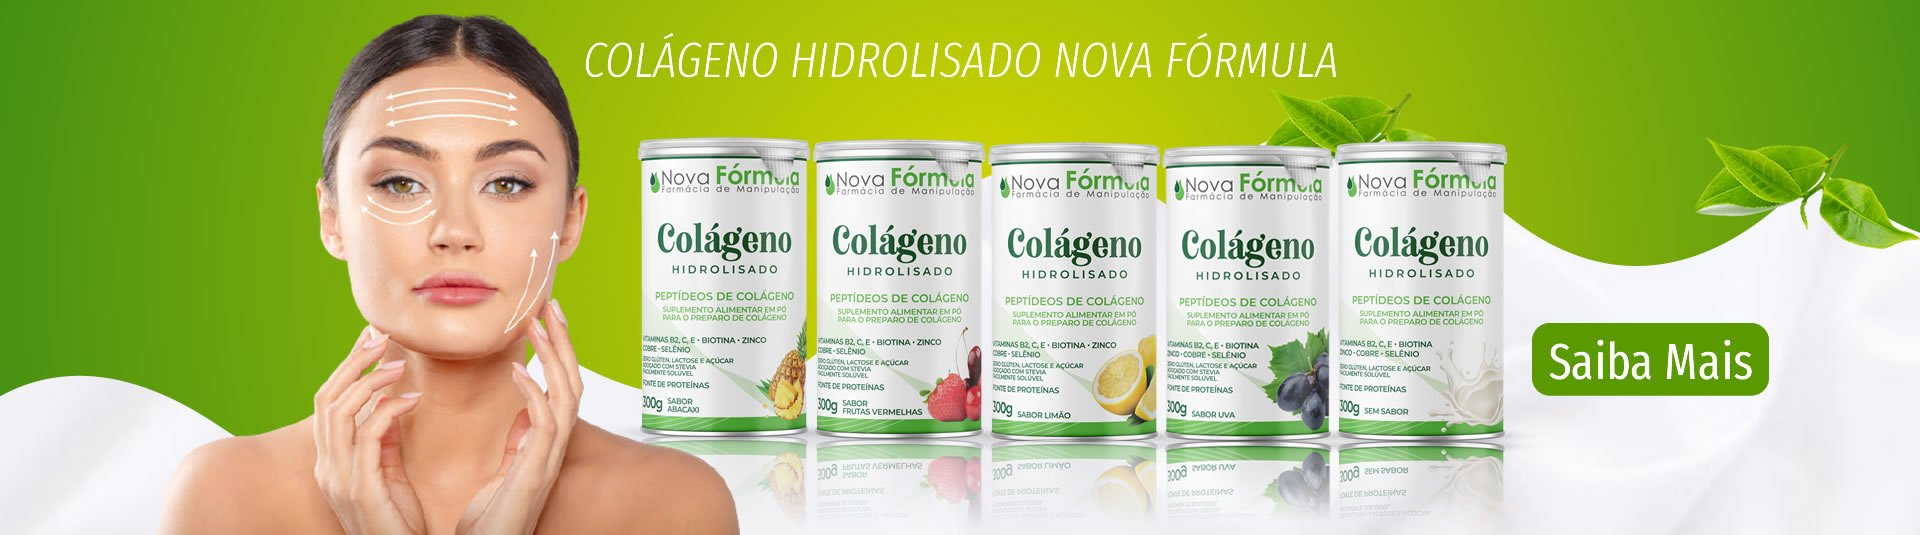 Colágeno Nova Fórmula